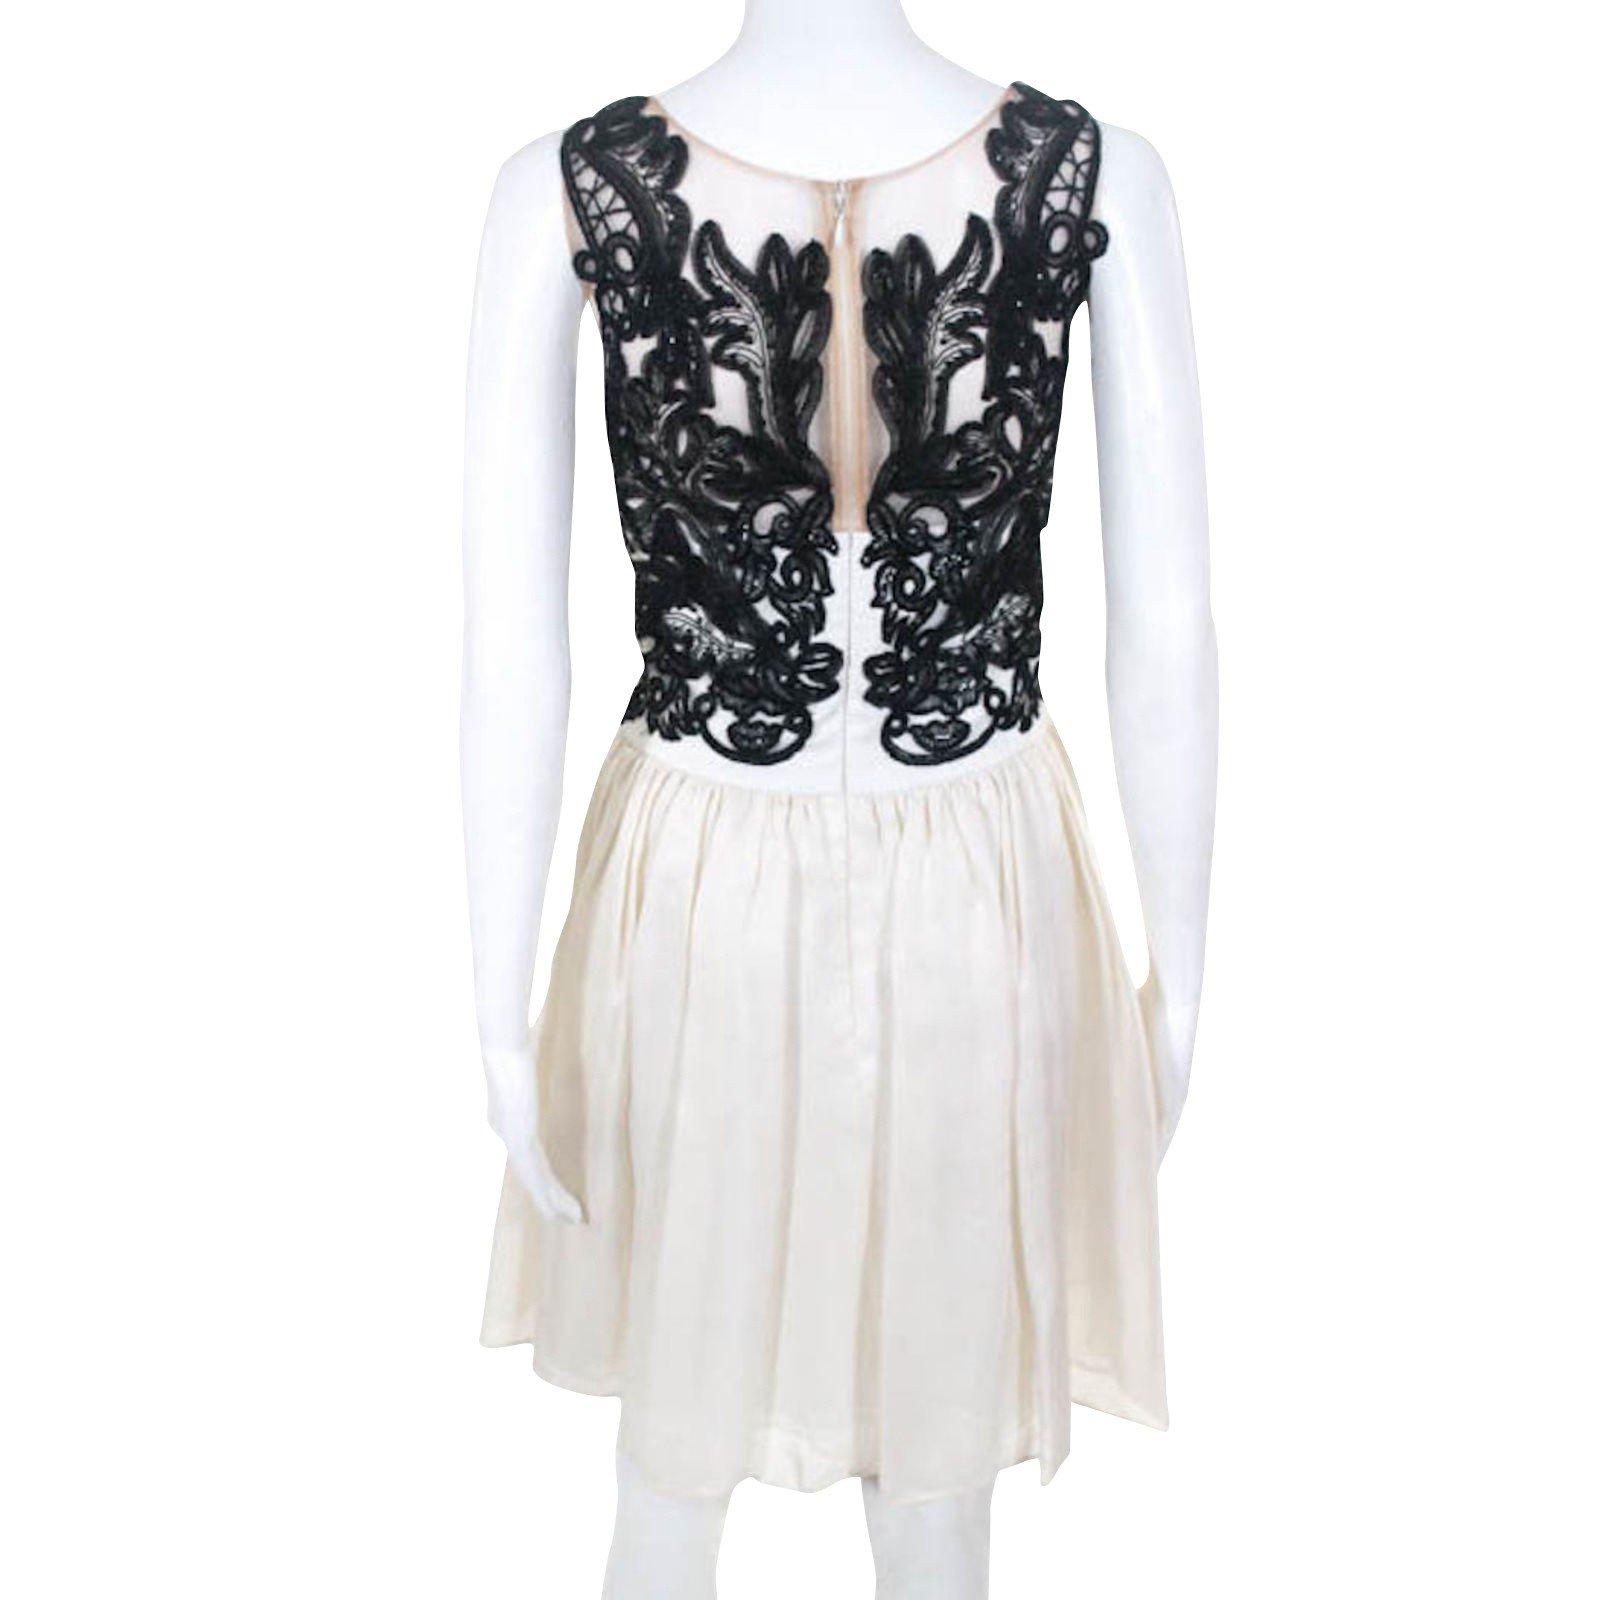 b73e366b1223 Marchesa Marchesa Notte Gazaar silk dress Dresses Silk Black,White  ref.99578 - Joli Closet